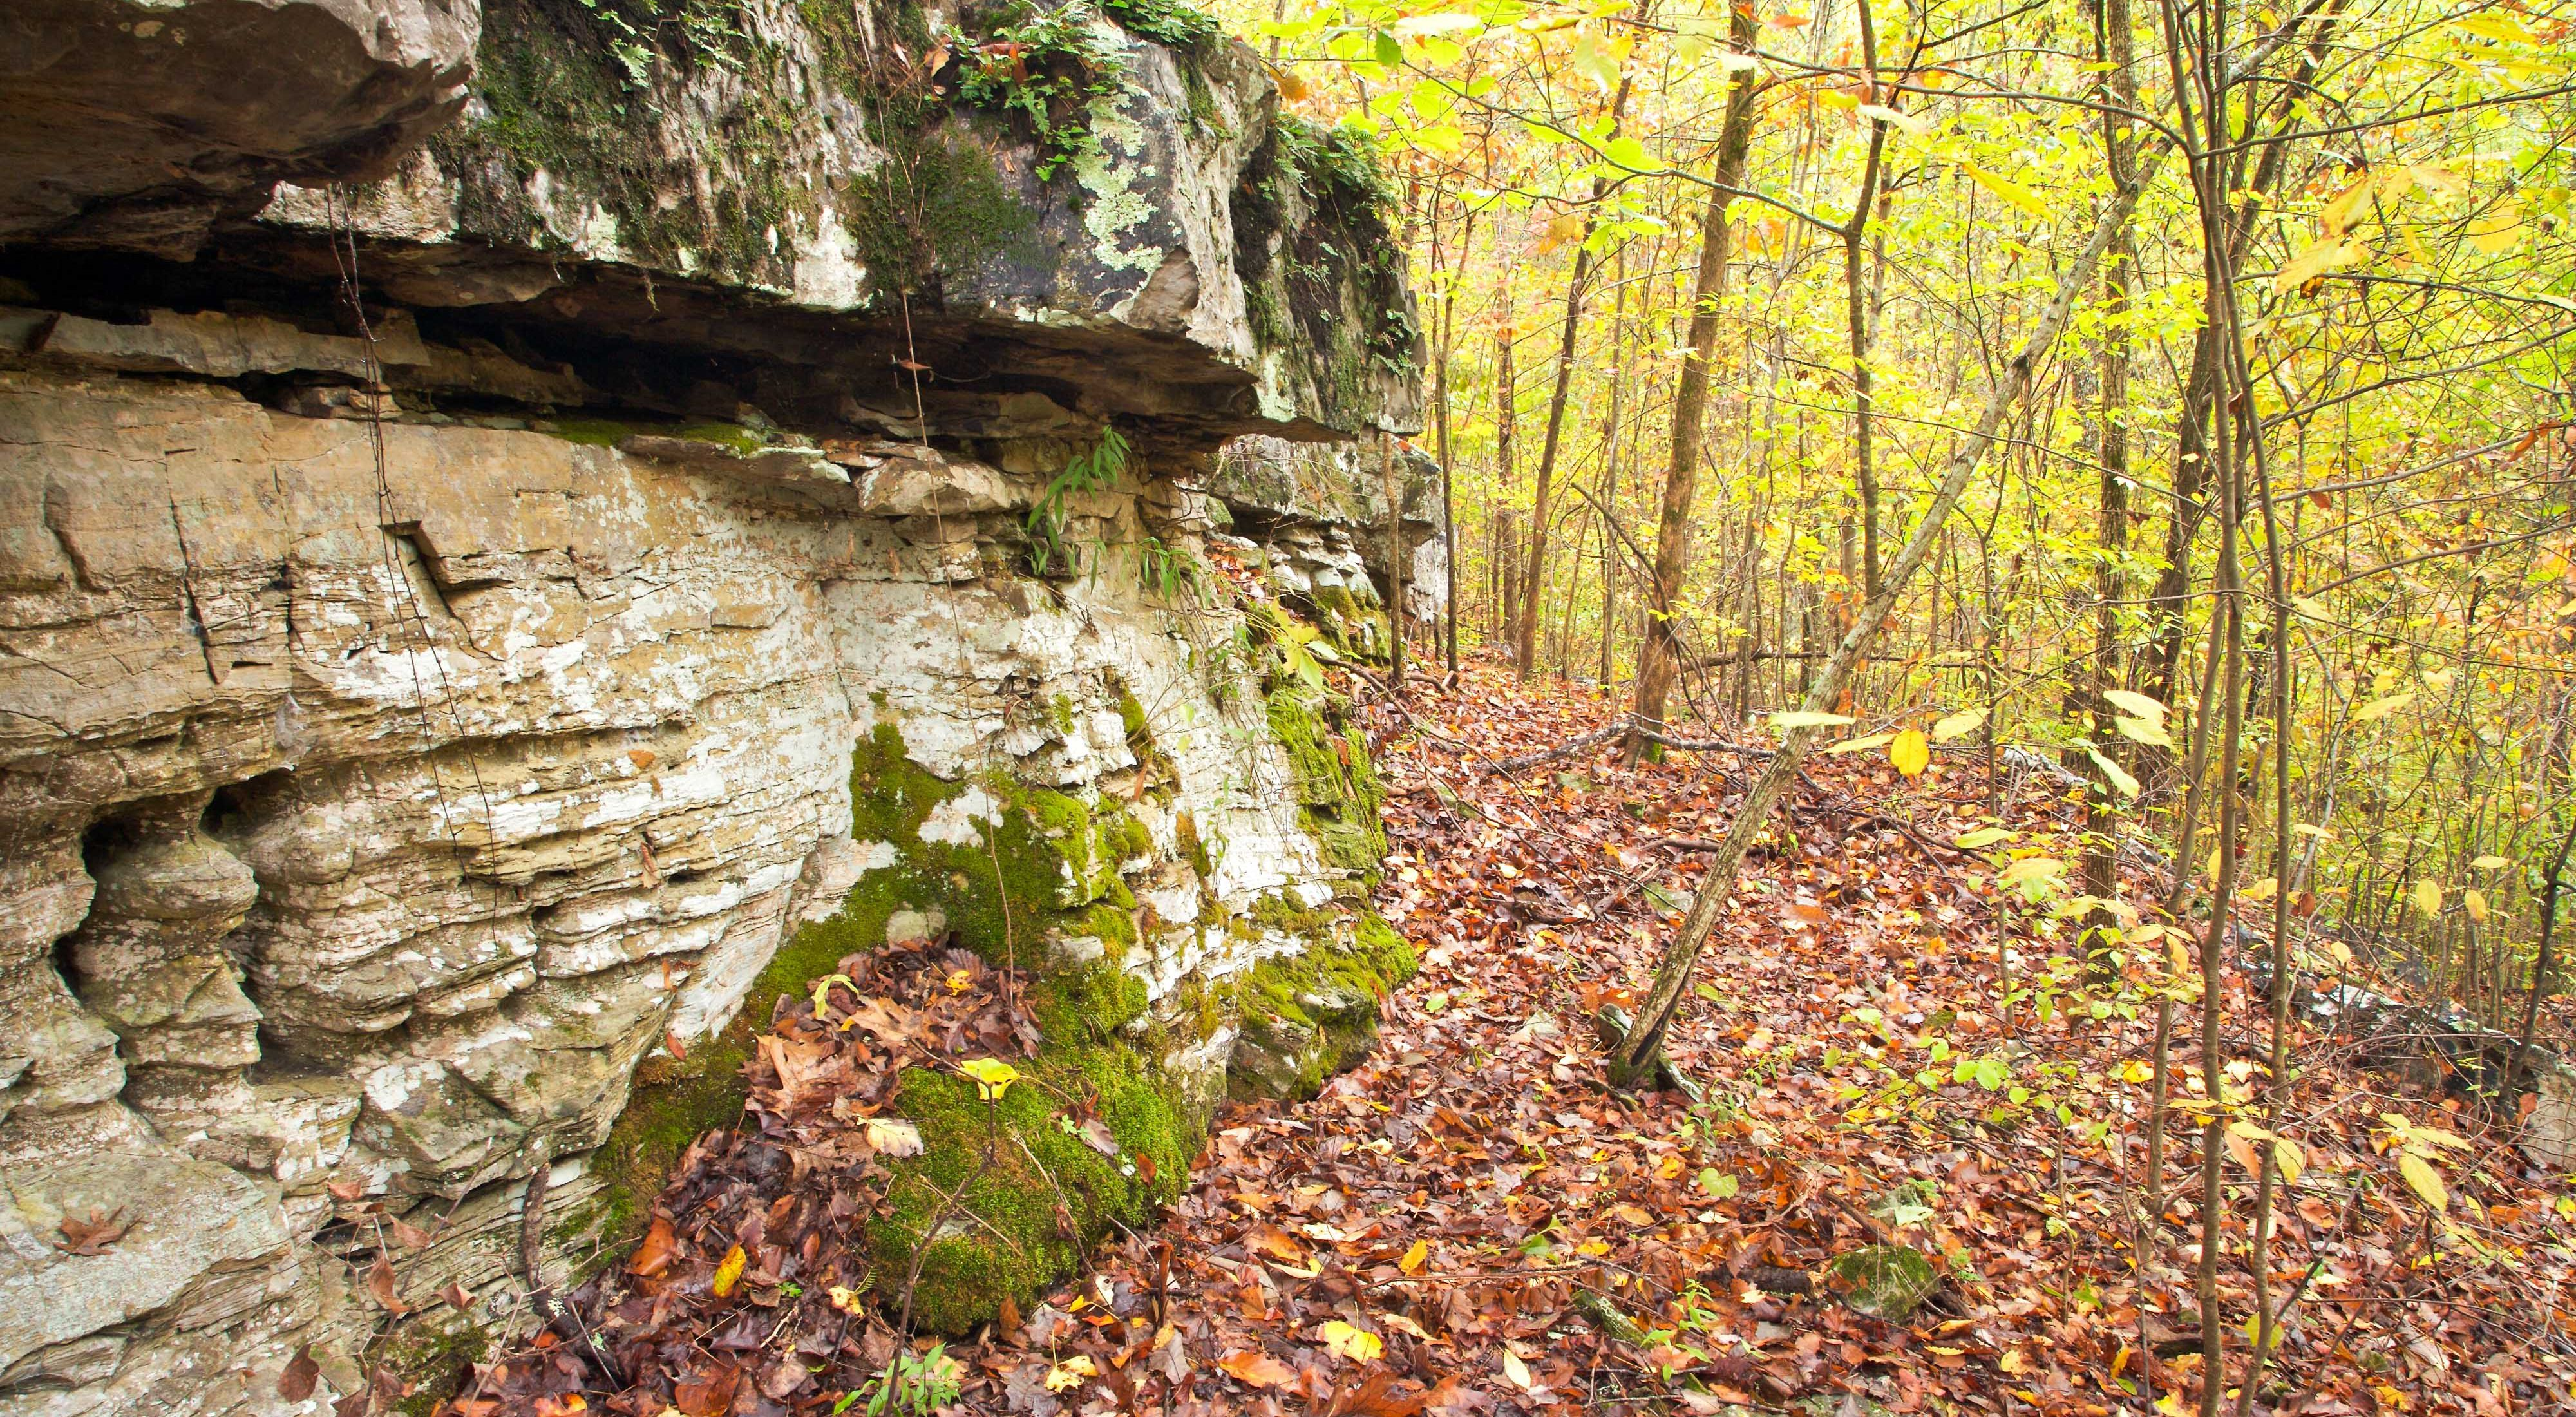 Limestone bluff and rocks in the forest at Black's Bluff Preserve, Georgia